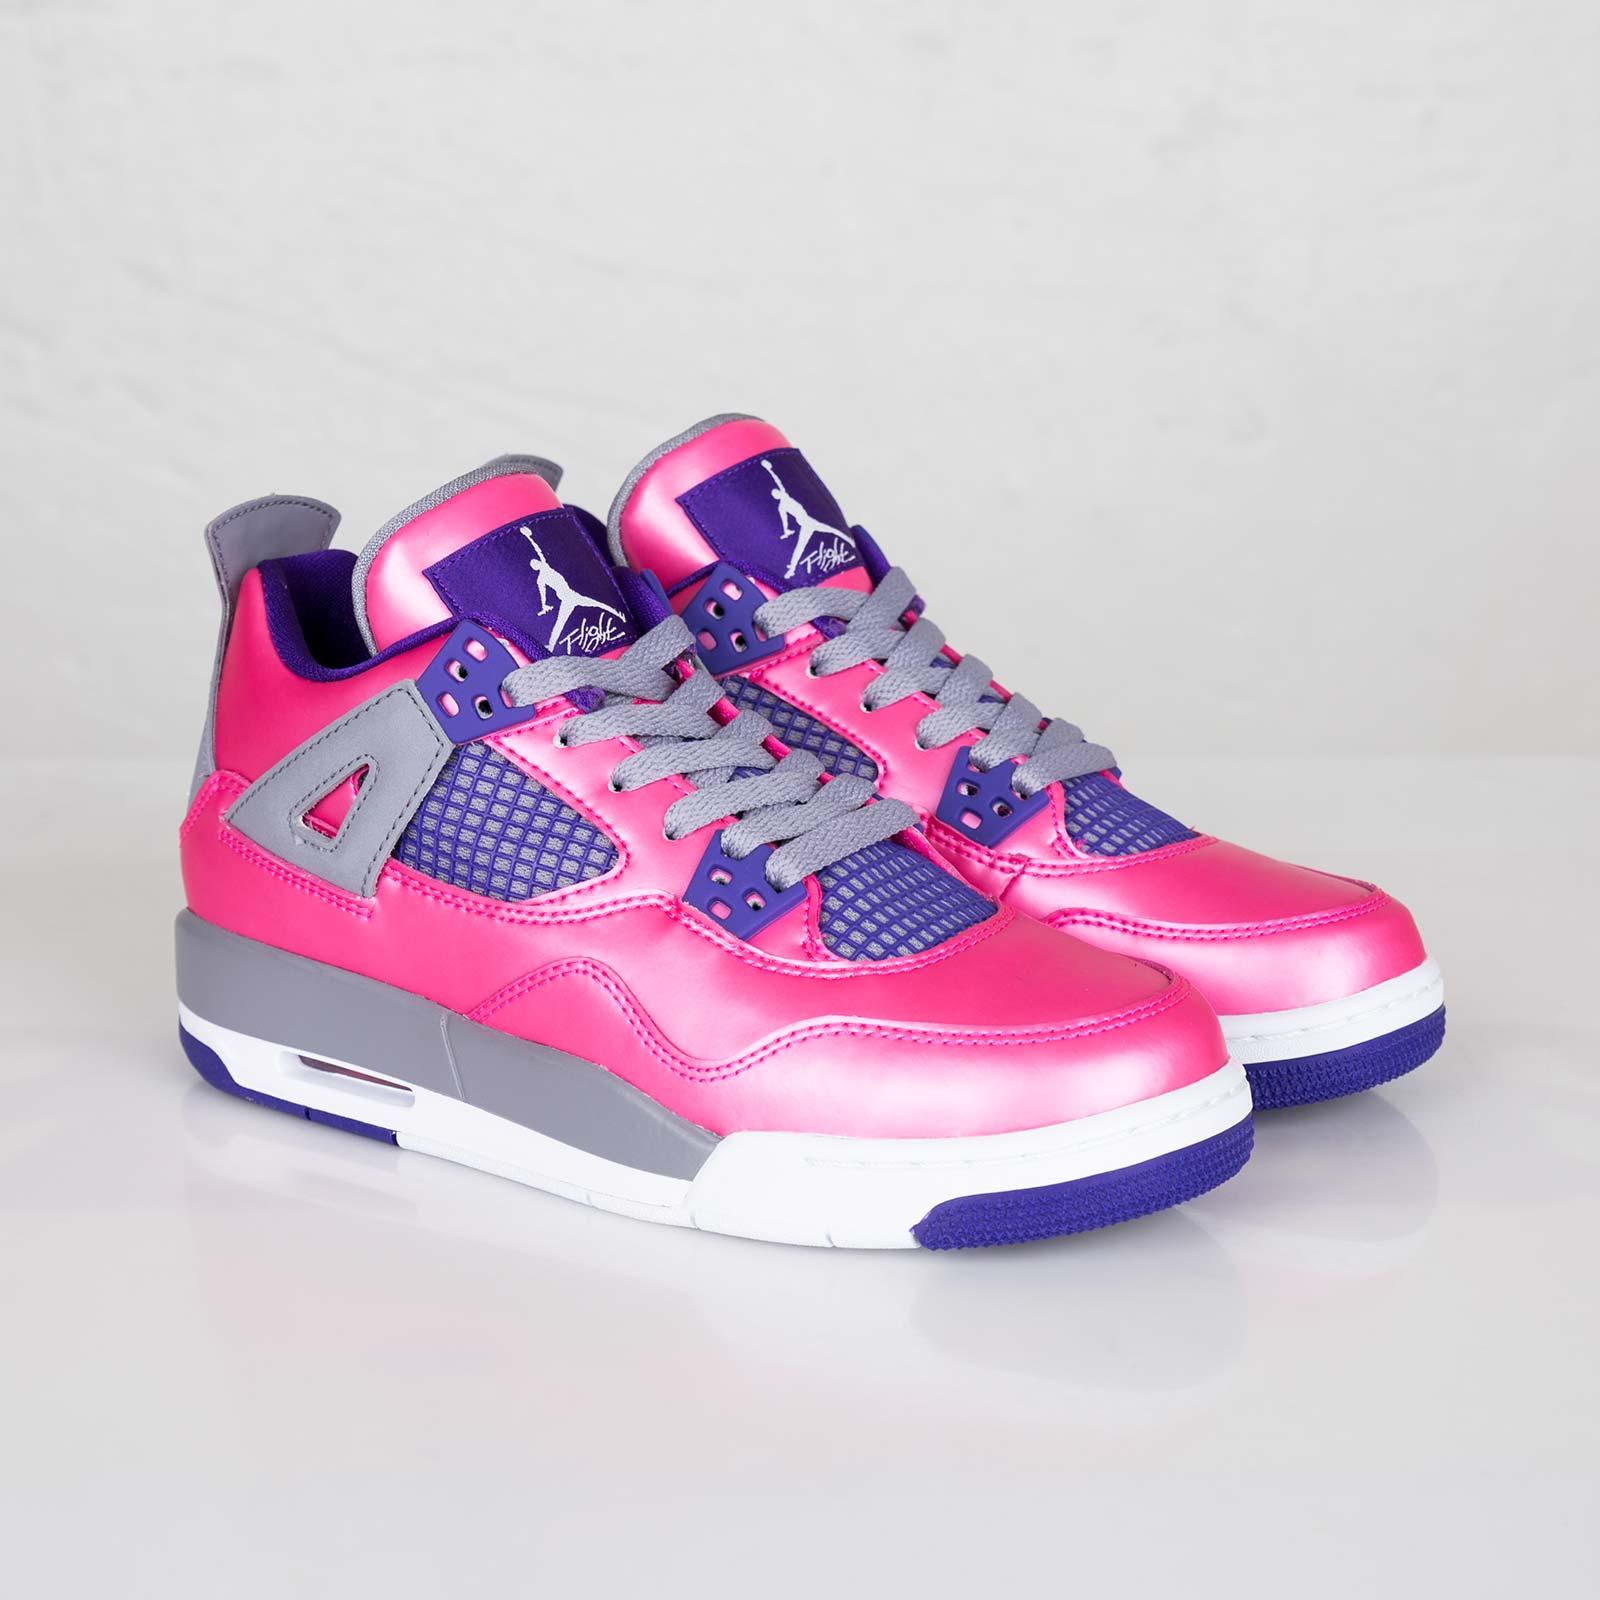 3bd6e0b0daec Jordan Brand Girls Air Jordan 4 Retro (GS) - 487724-607 ...